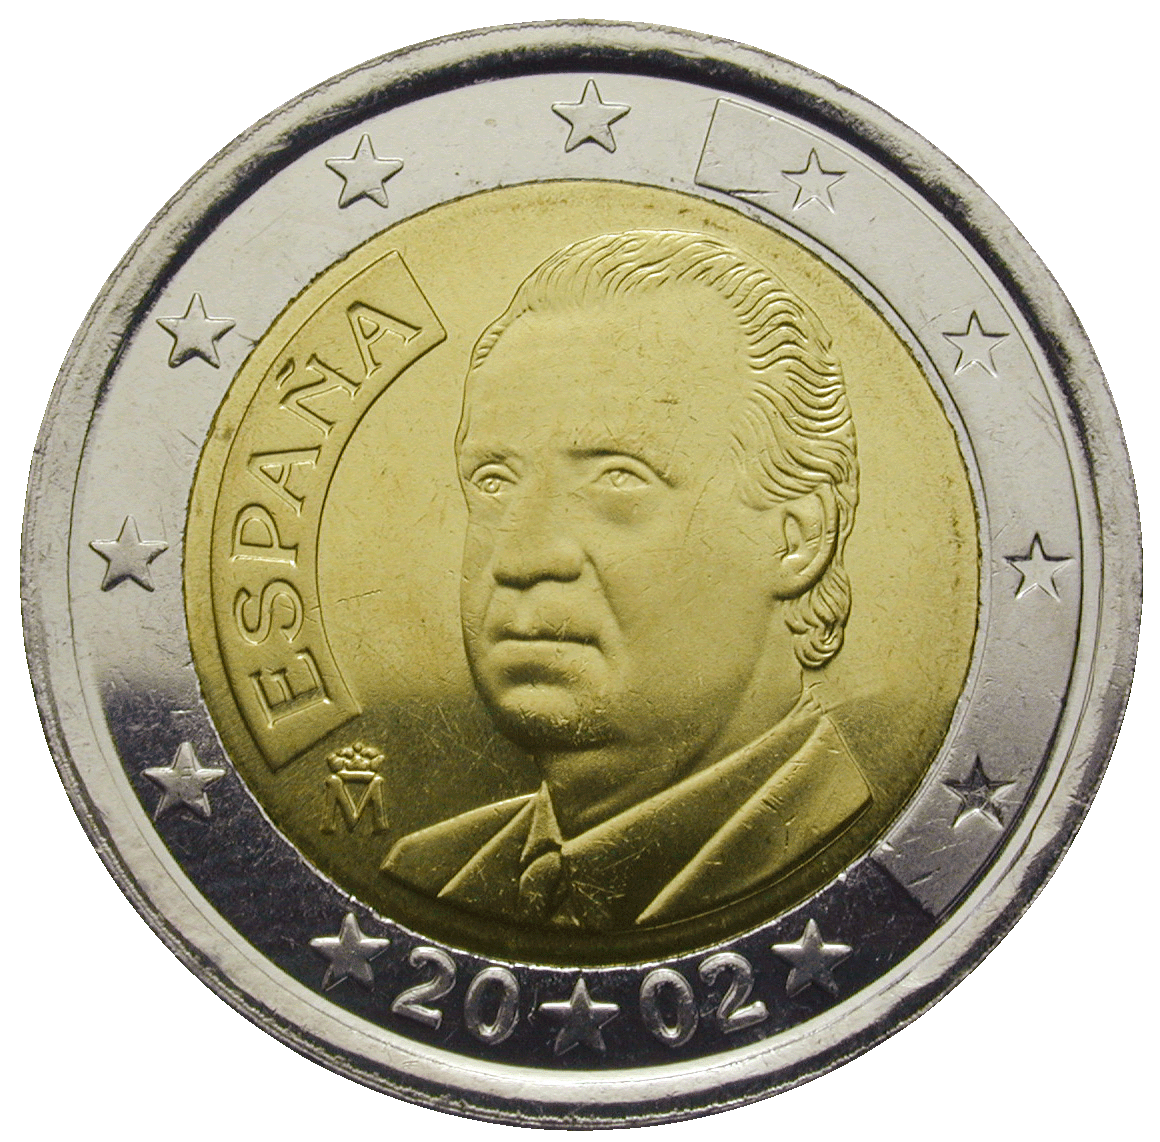 Coins | Sunflower Foundation